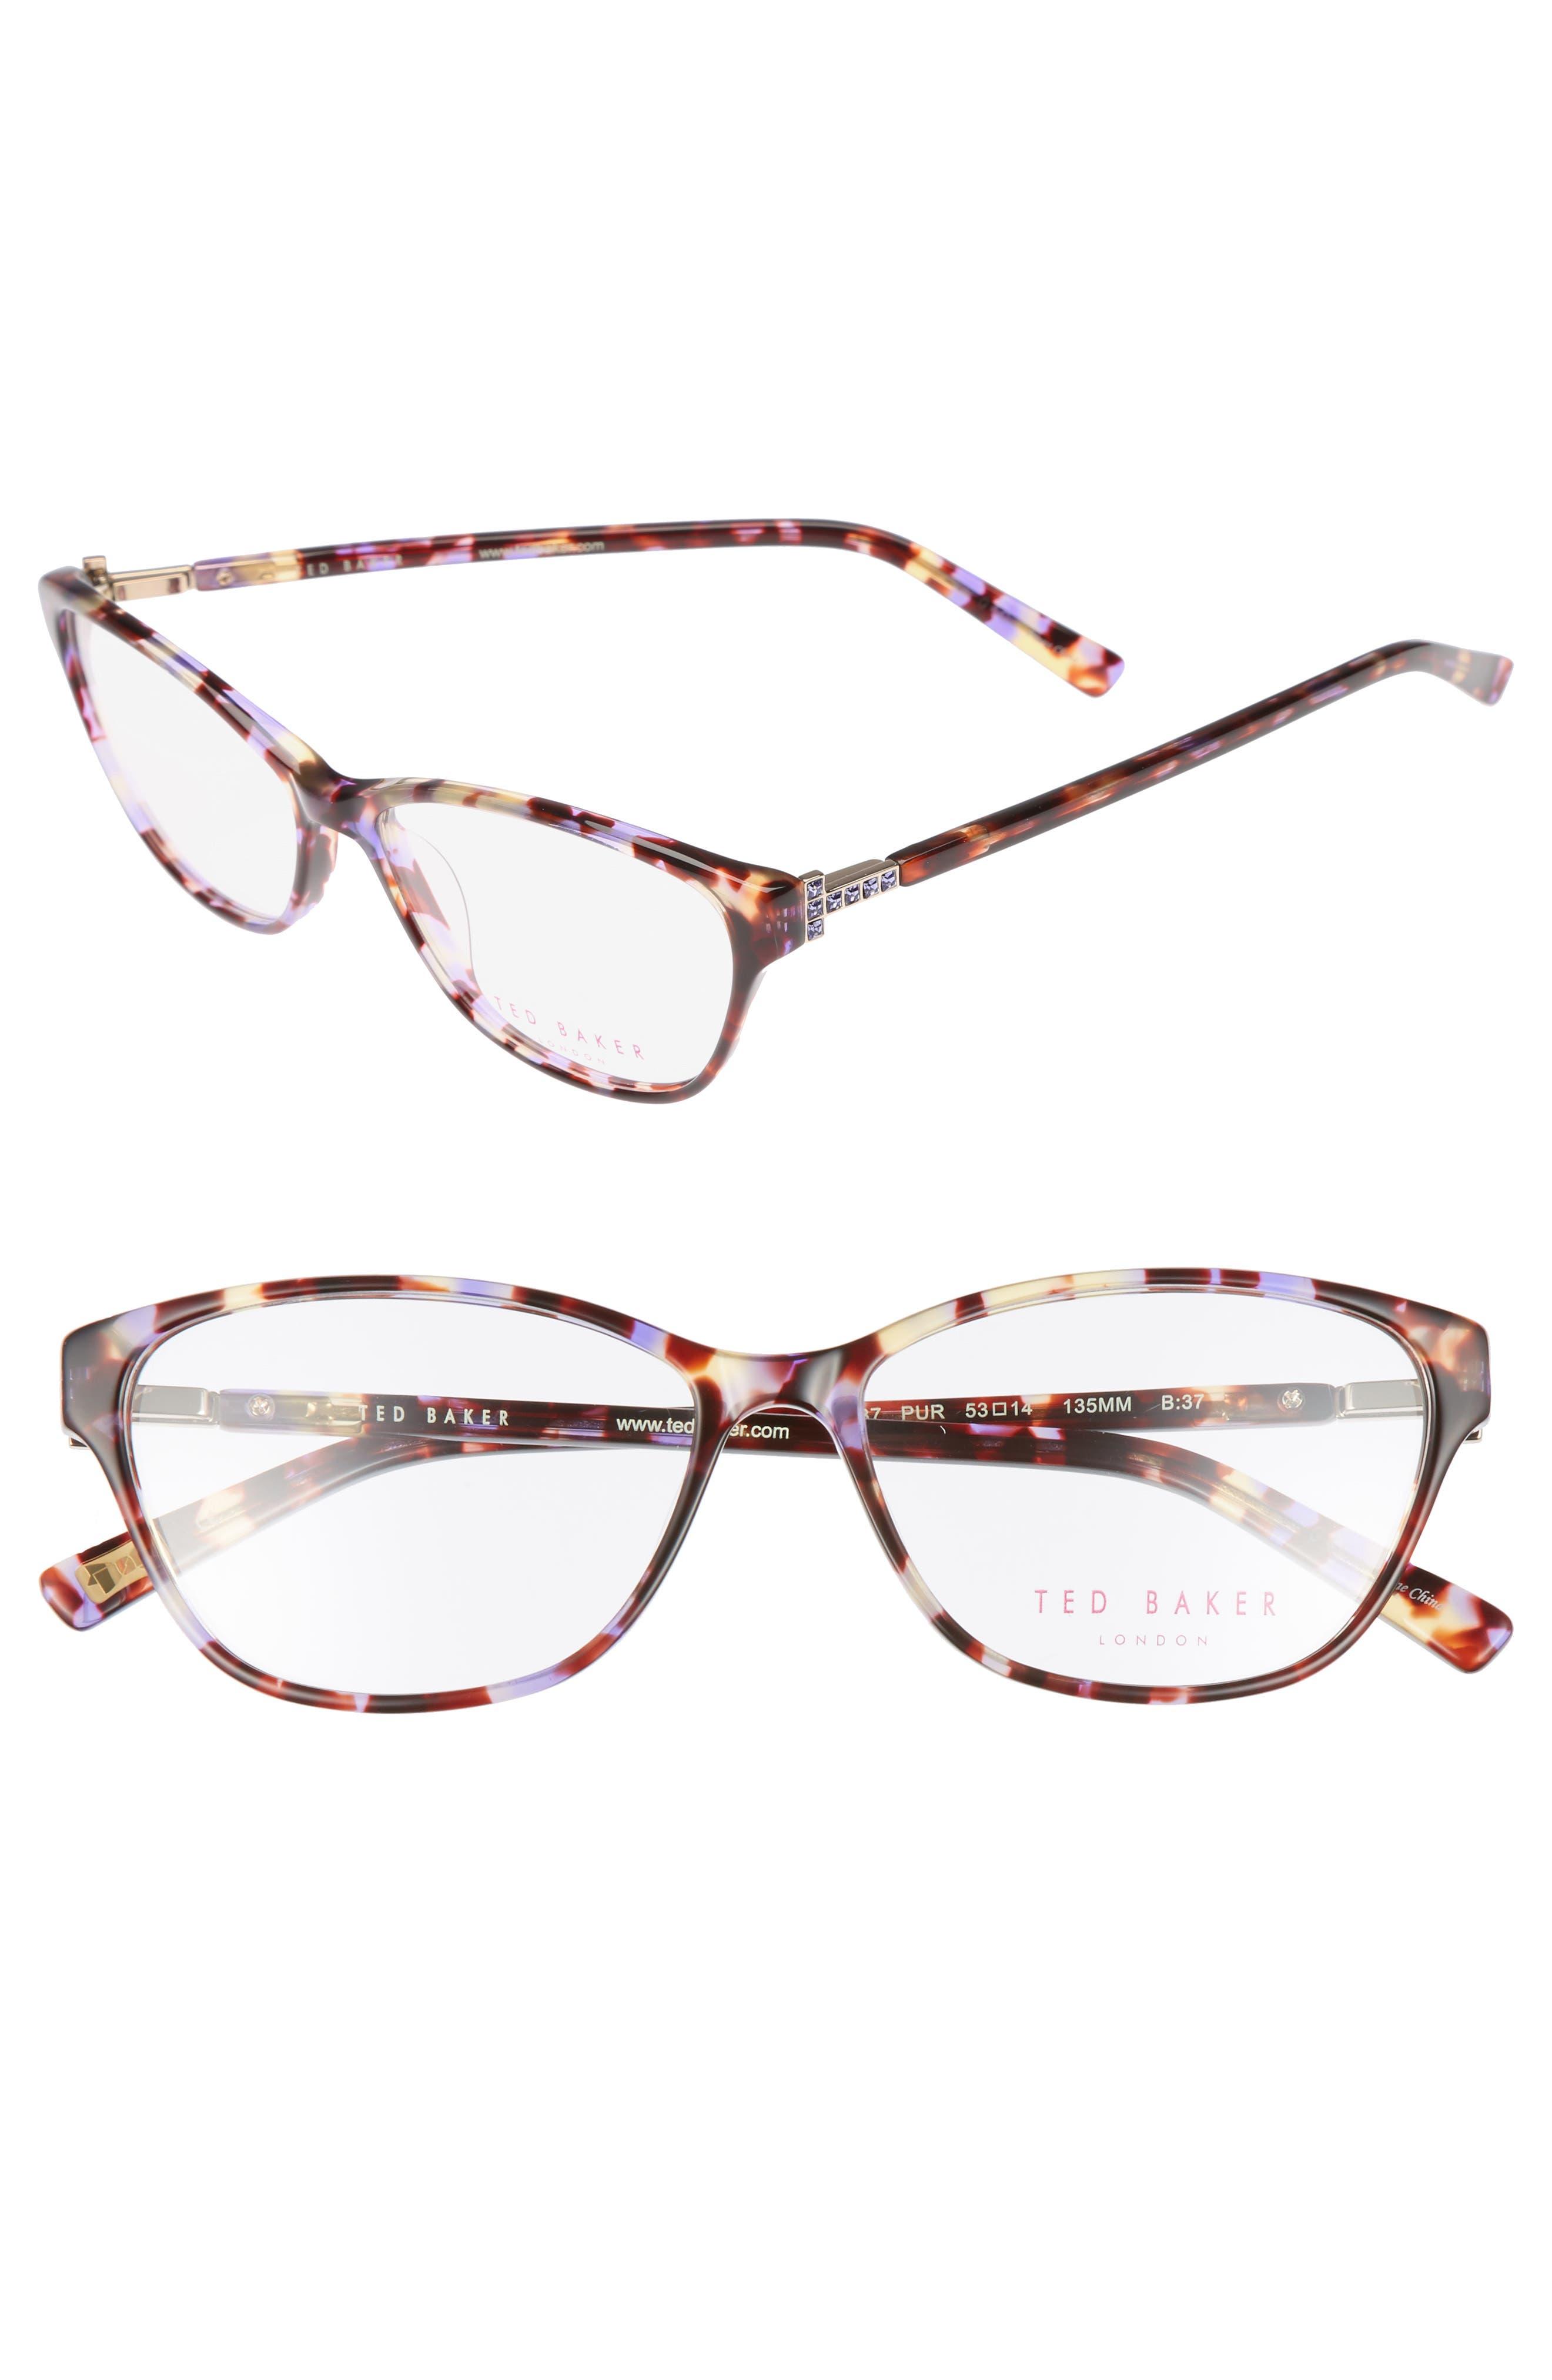 53mm Optical Cat Eye Glasses,                             Main thumbnail 1, color,                             Purple